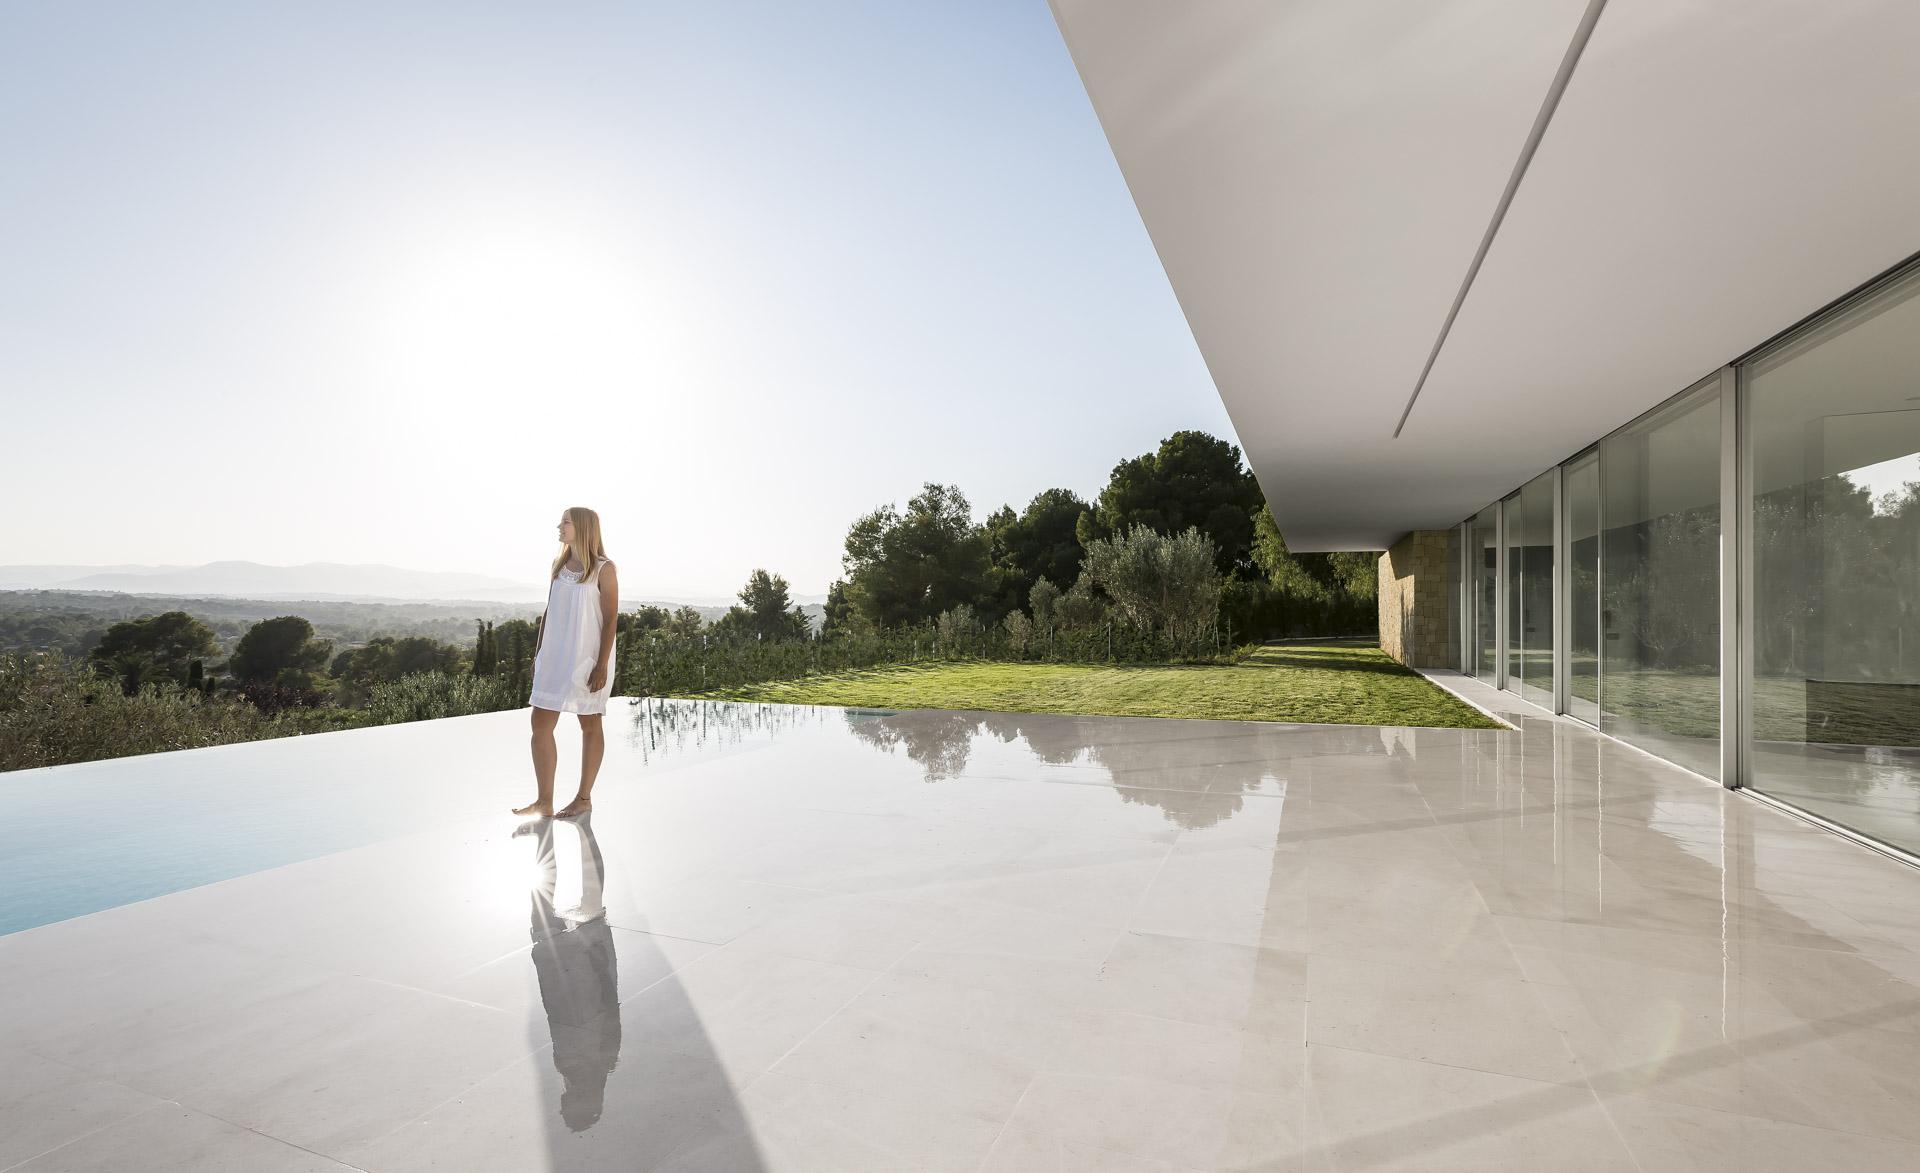 fotografia-arquitectura-valencia-german-cabo-gallardo-llopis-villamarchante-vivienda-37